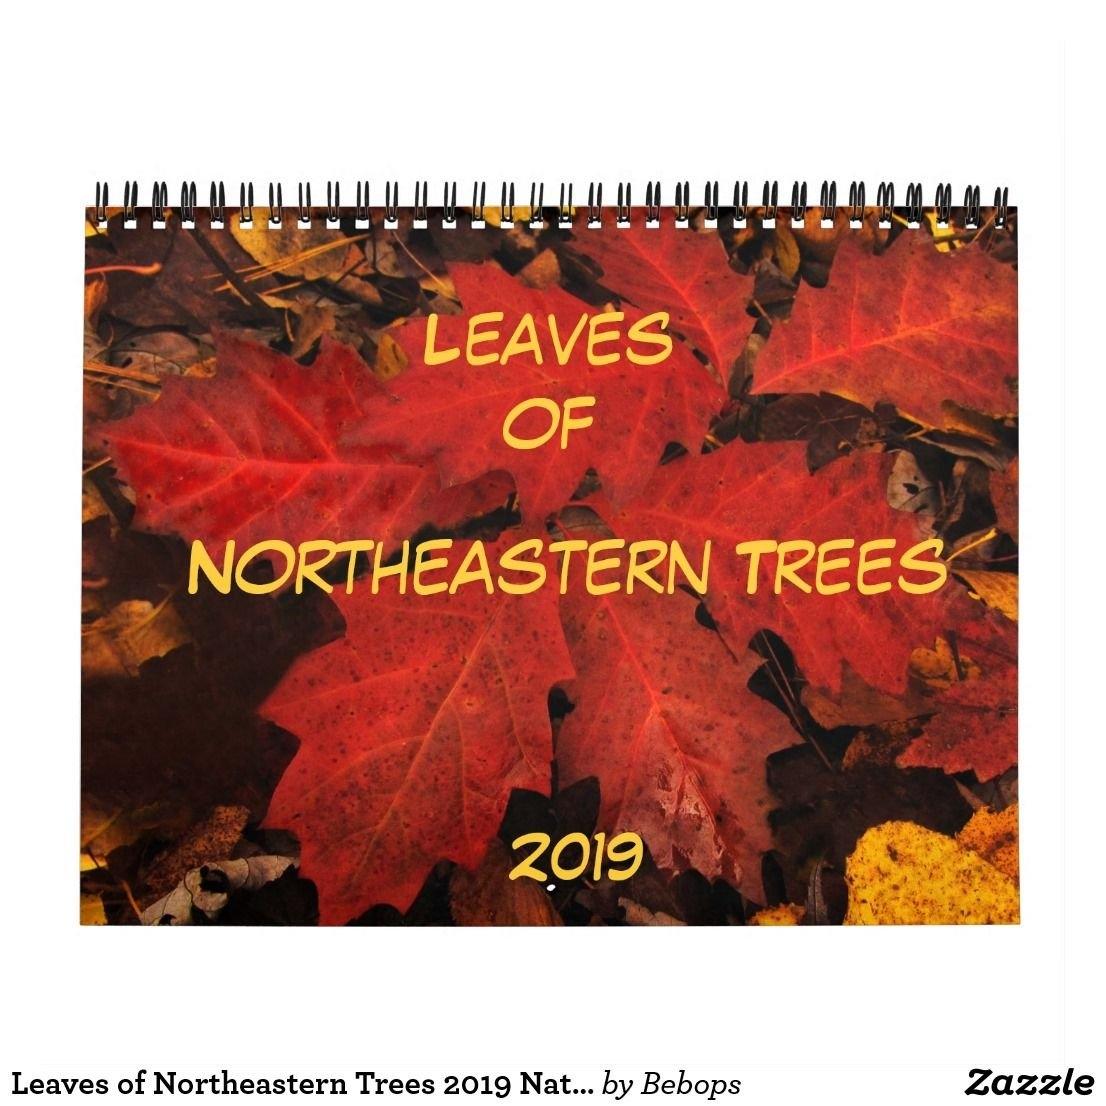 Leaves Of Northeastern Trees 2019 Nature Calendar | 2019 Calendars Calendar 2019 Northeastern